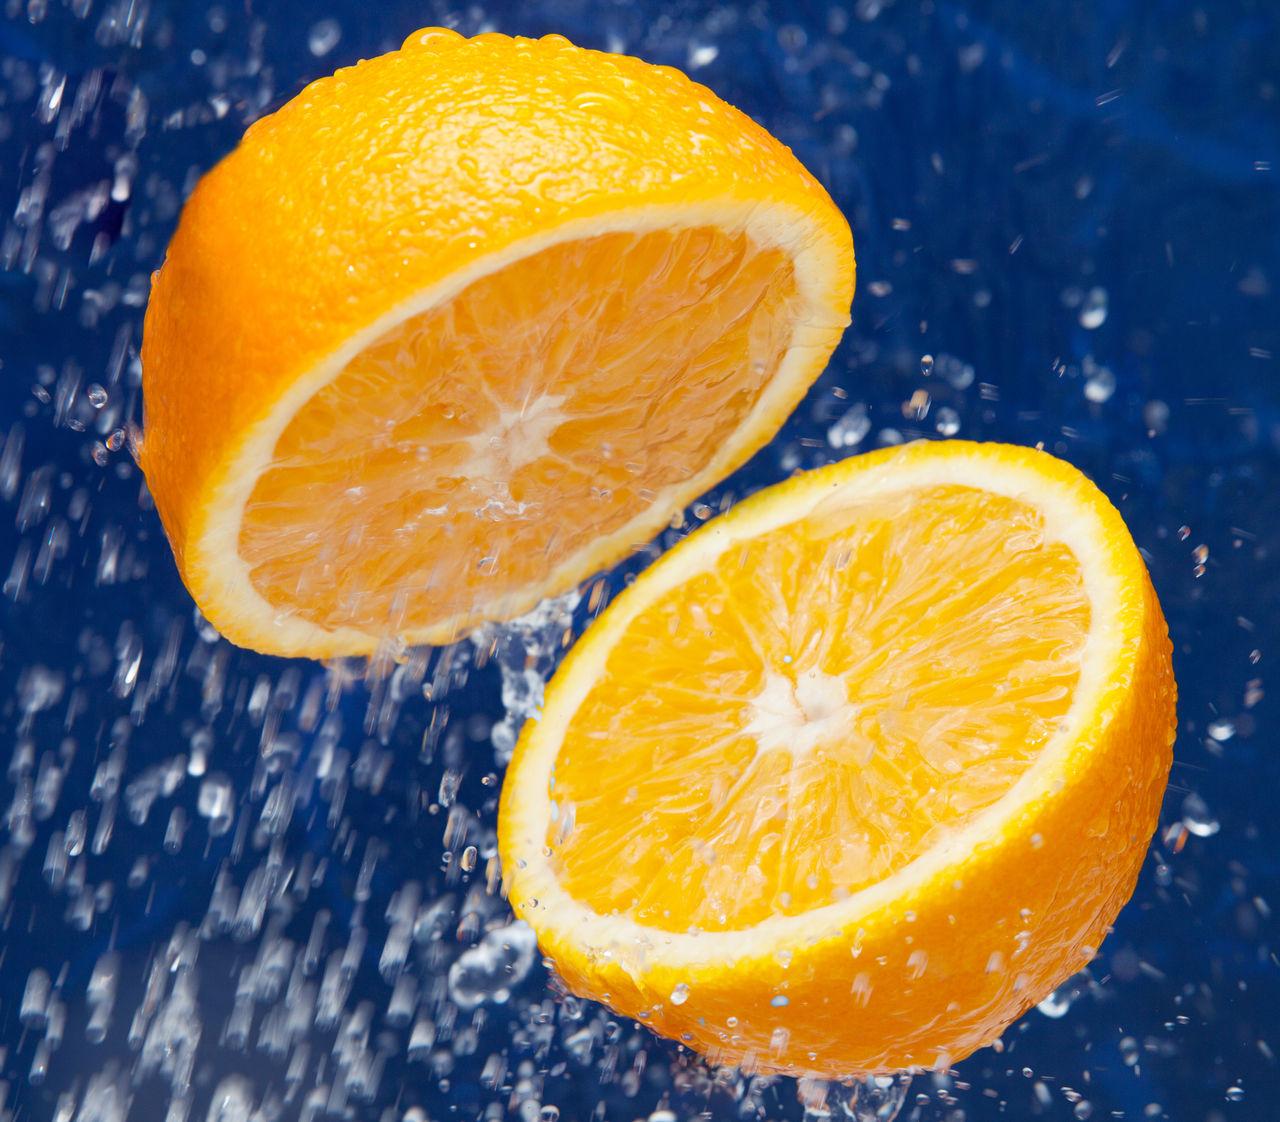 Fresh sweet orange with drops of water Blood Orange Citrus Fruit Close-up Cross Section Food Freshness Fruit Grapefruit Halved Healthy Eating Juicy No People Orange - Fruit Orange Color SLICE Sour Taste Studio Shot